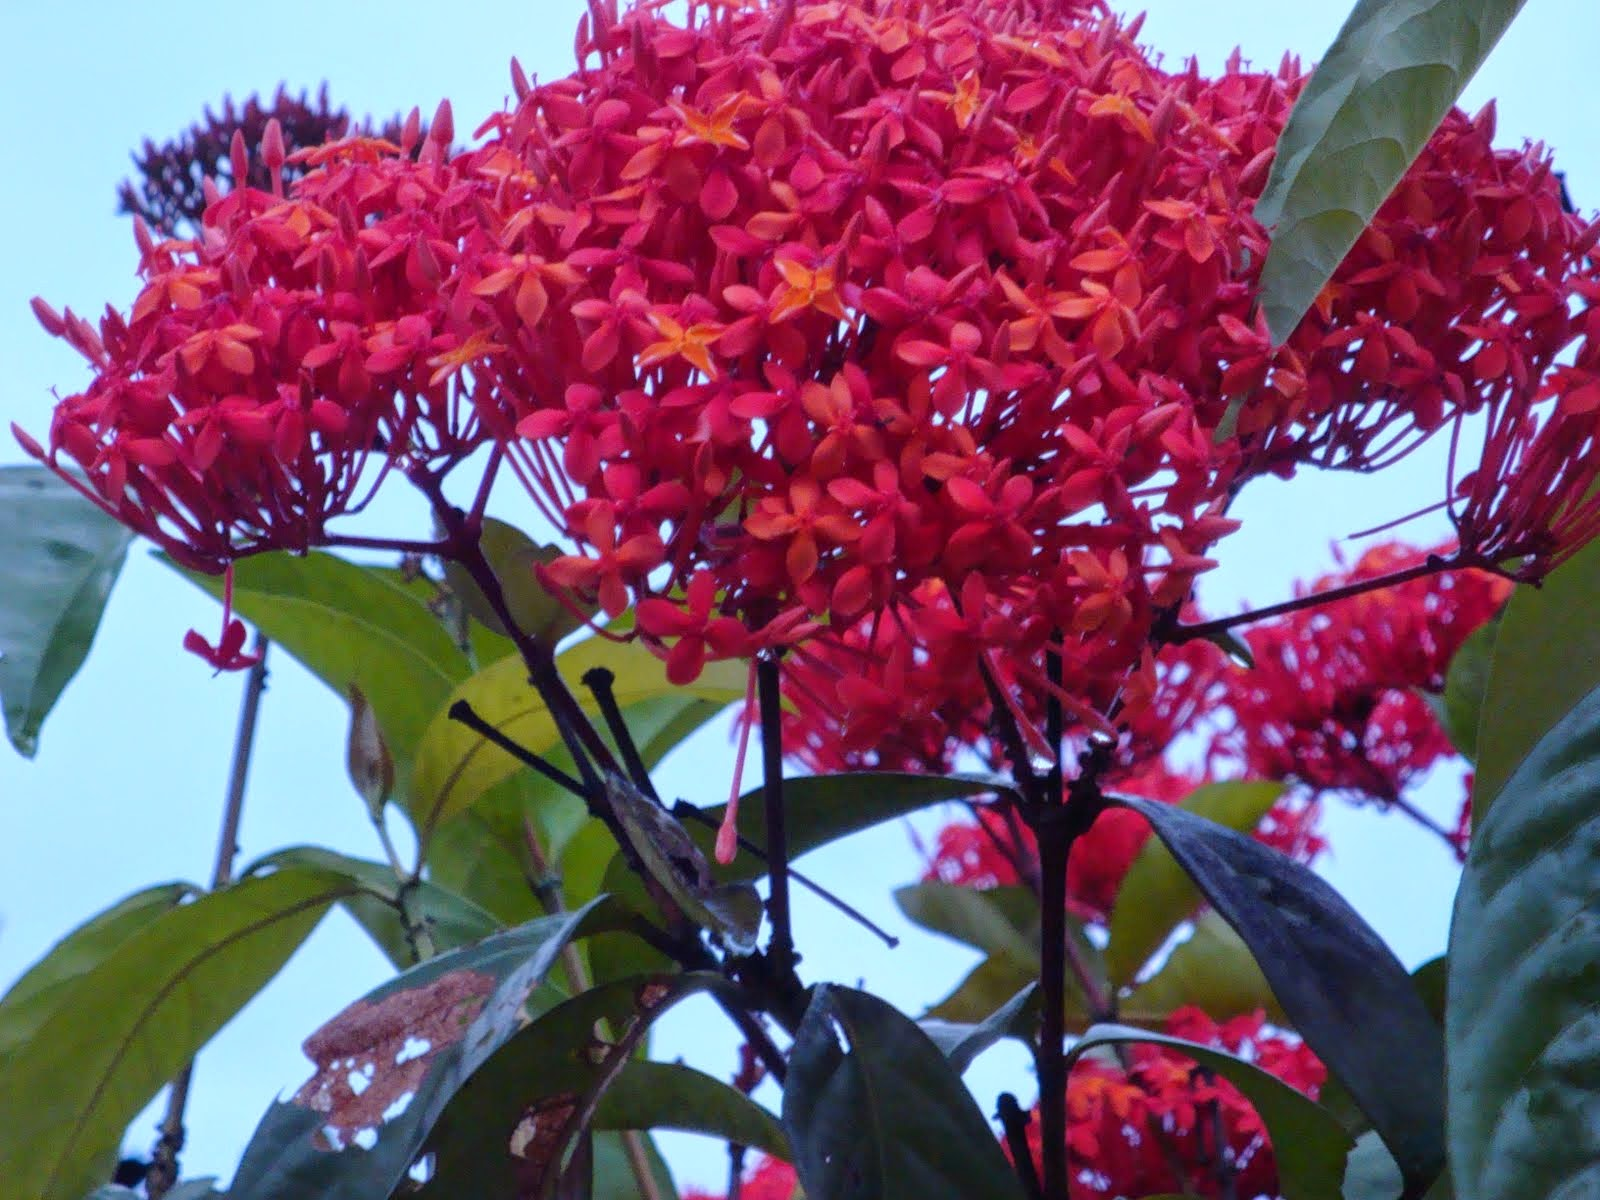 Munawi Inside Bunga Majemuk Campuran Inflorescentia Mixta